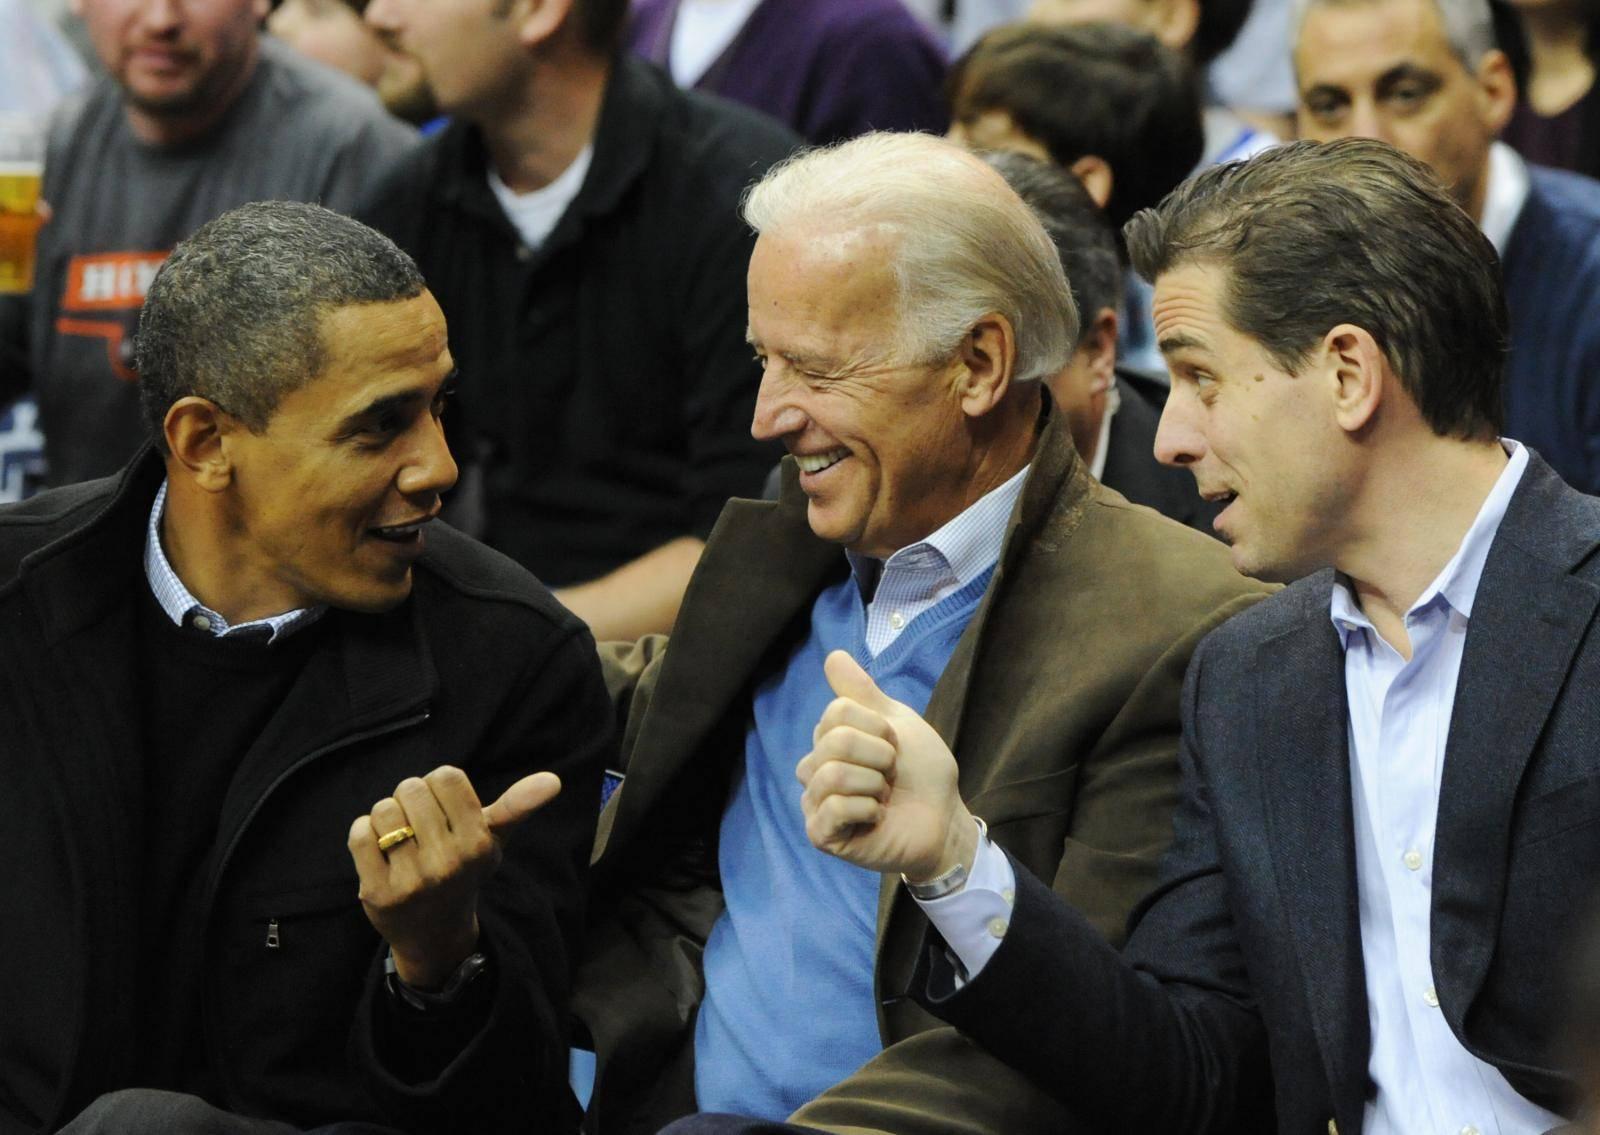 U.S. President Obama attends Georgetown vs Duke basketball game in Washington